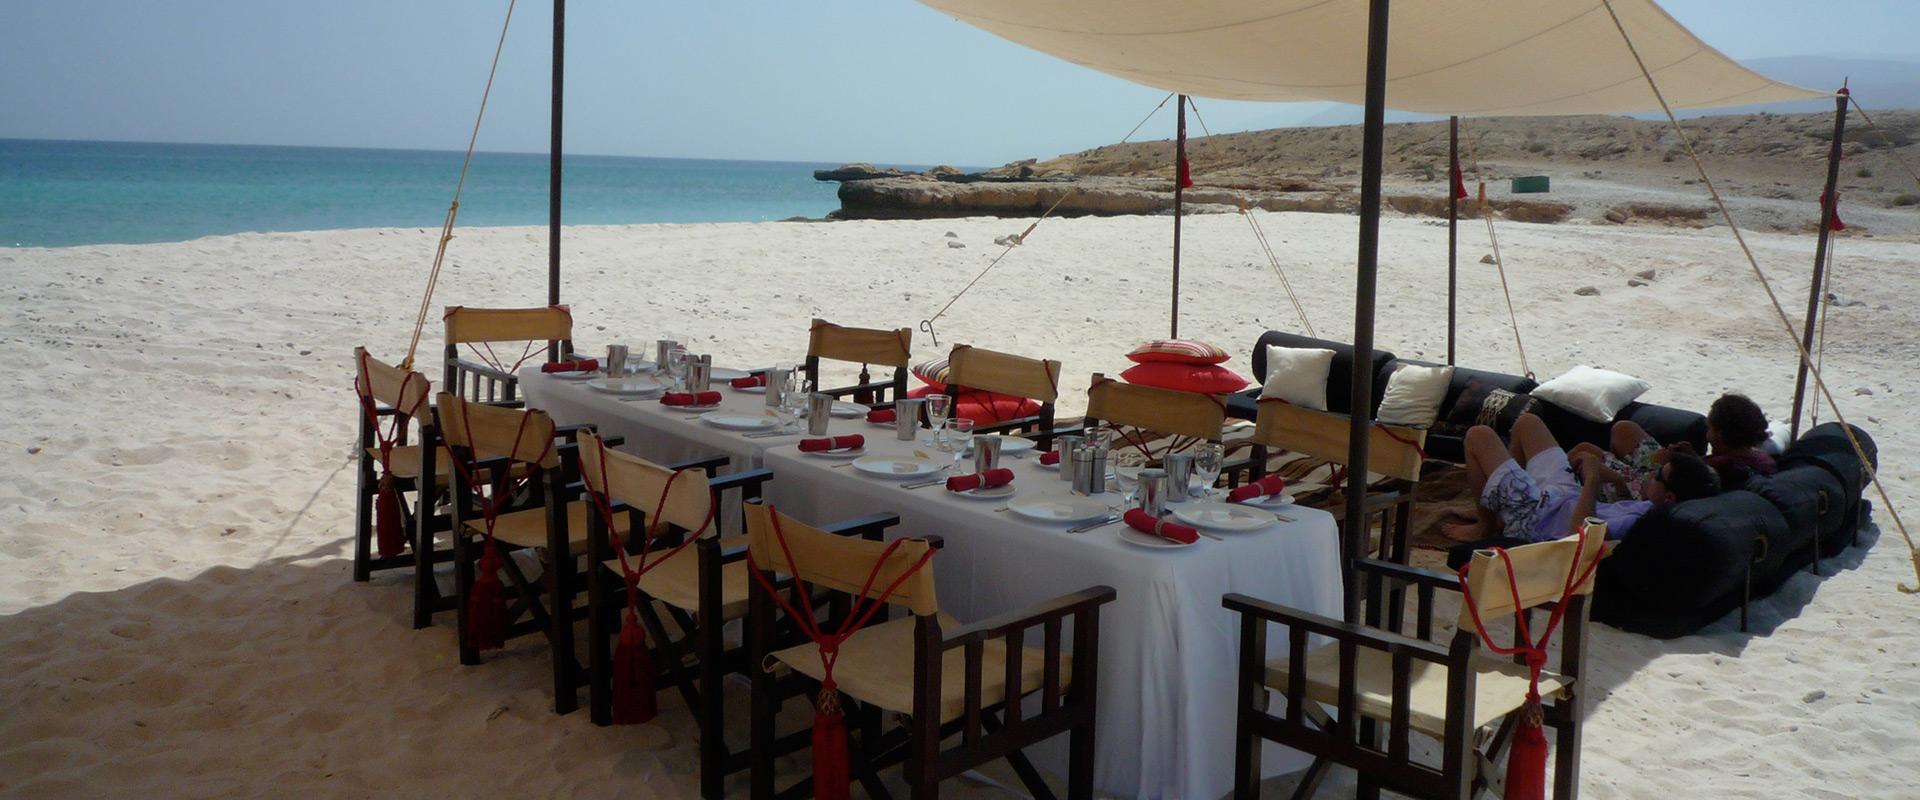 JOURNEYS - Southern Oman - Mirbat